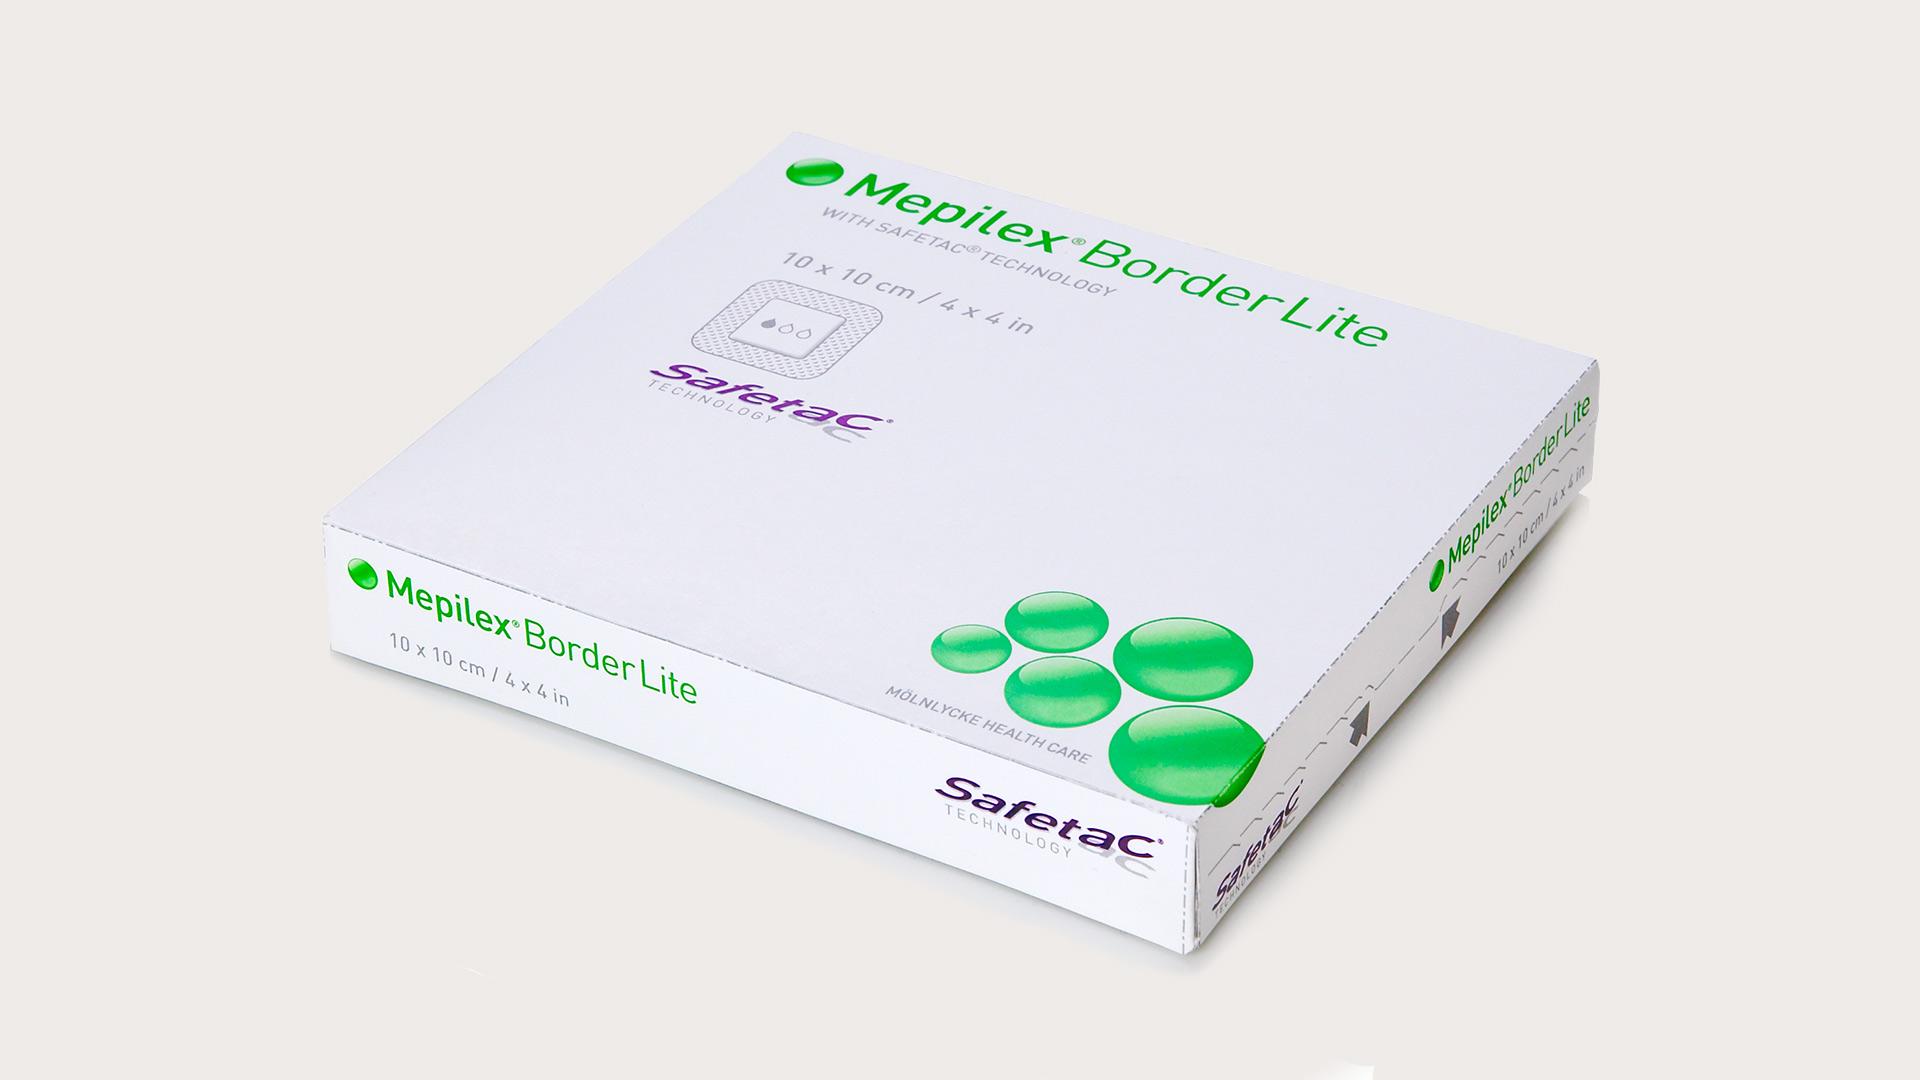 Mepilex Lite Silicone Foam Dressing 6x6 Box of 5